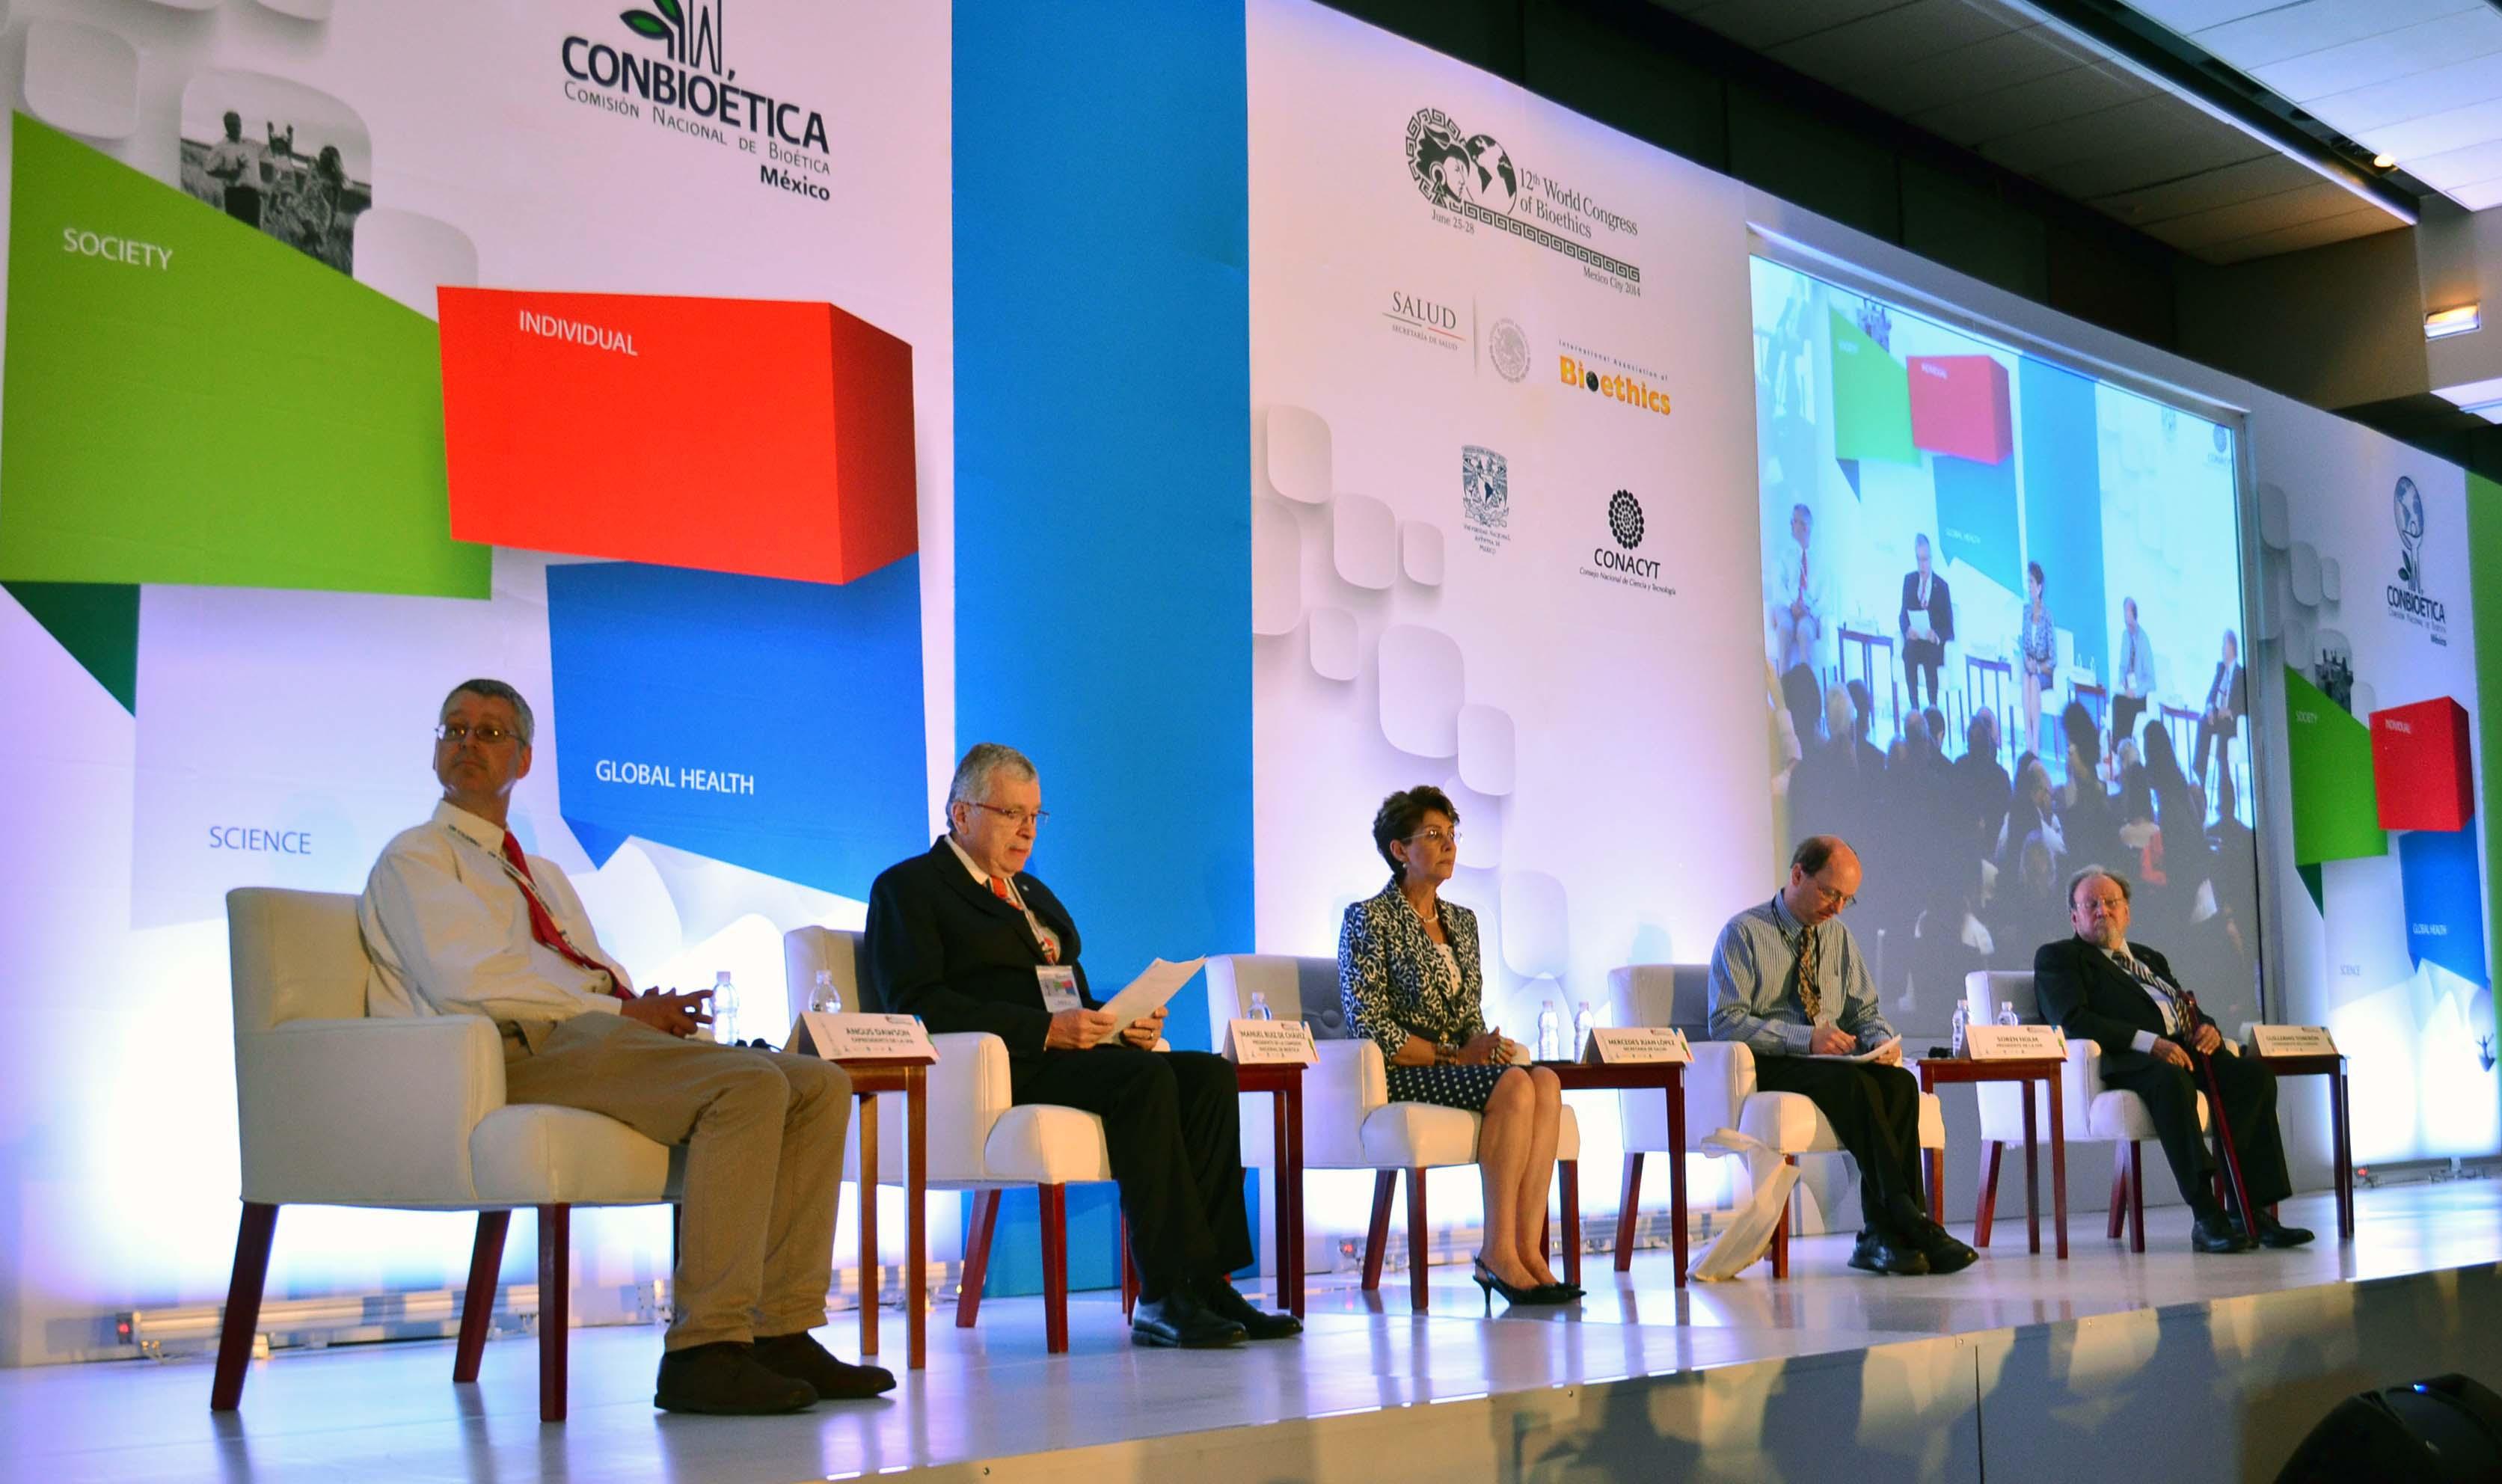 12 Congreso Mundial de Bioética